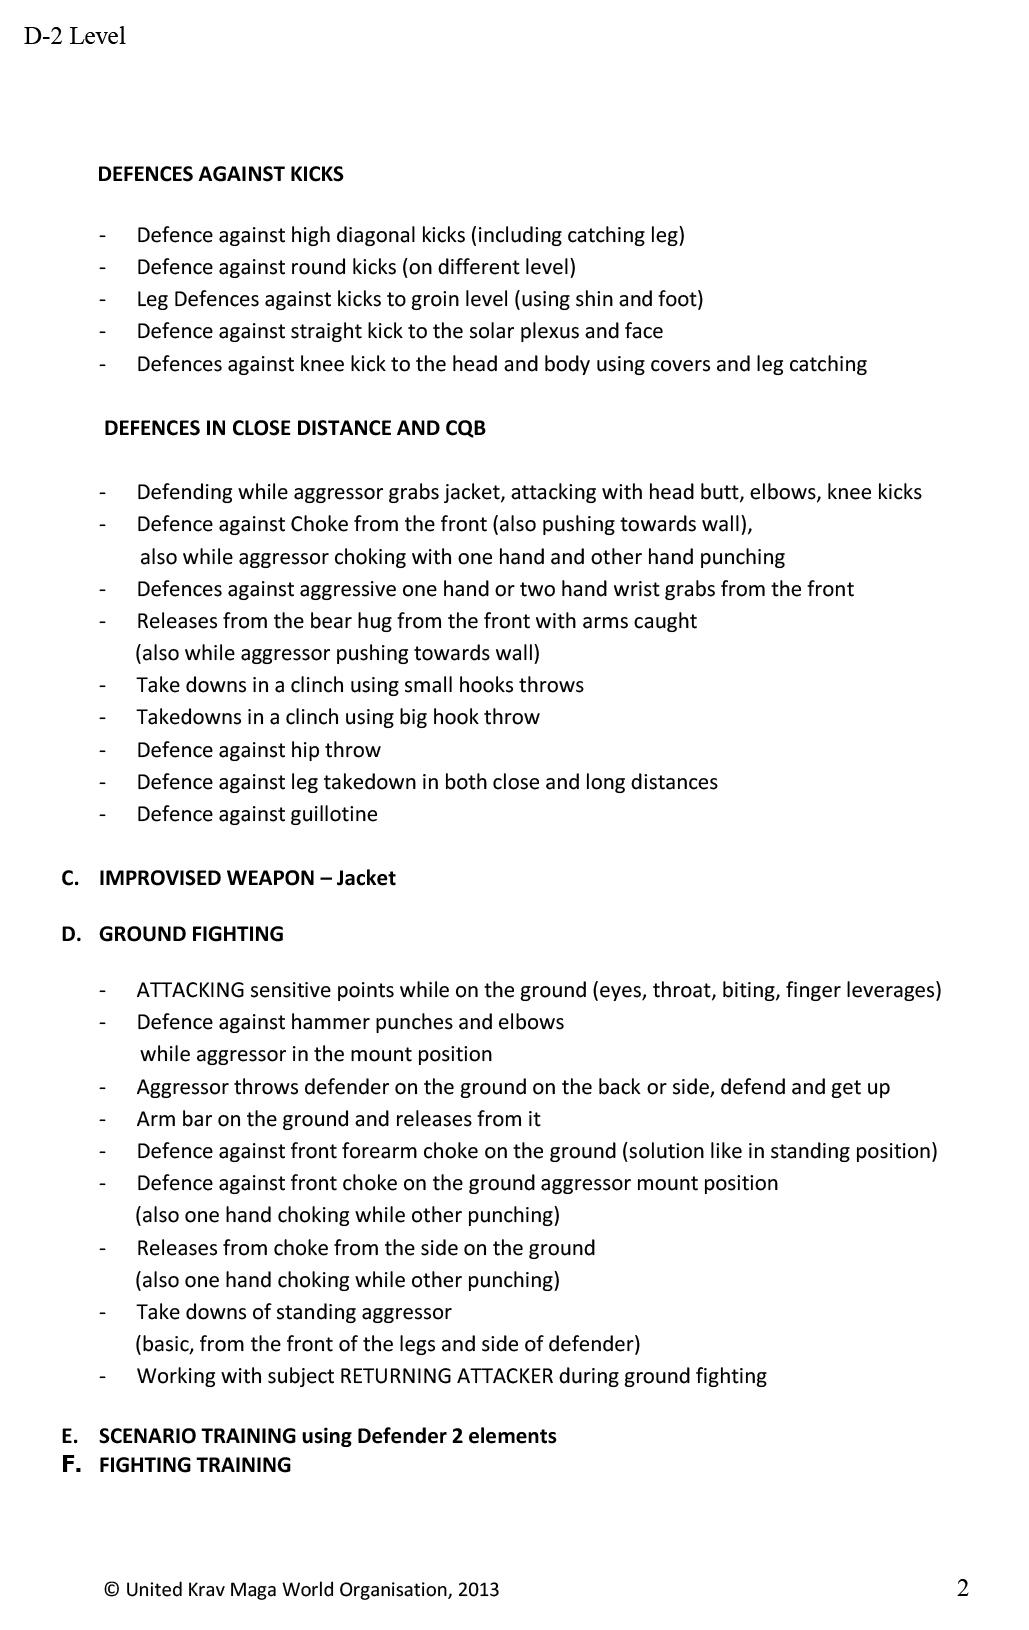 D2_ENGLISH.pdf-2.jpg